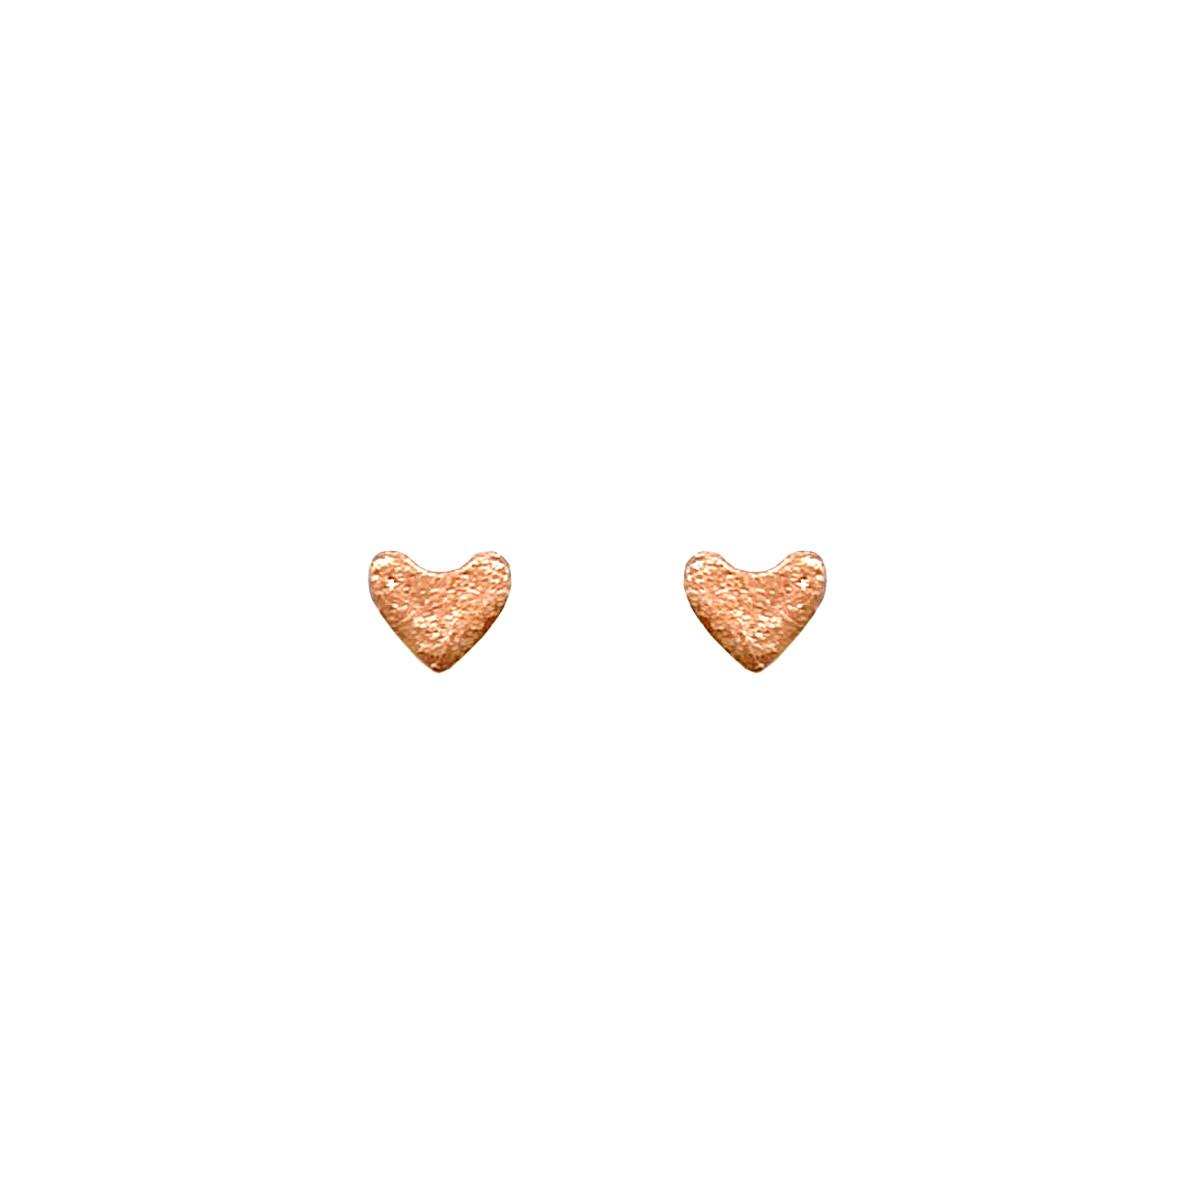 "Сережки Xuping ""Серденька"" з медичного золота, позолота 18K, 24513 (1)"